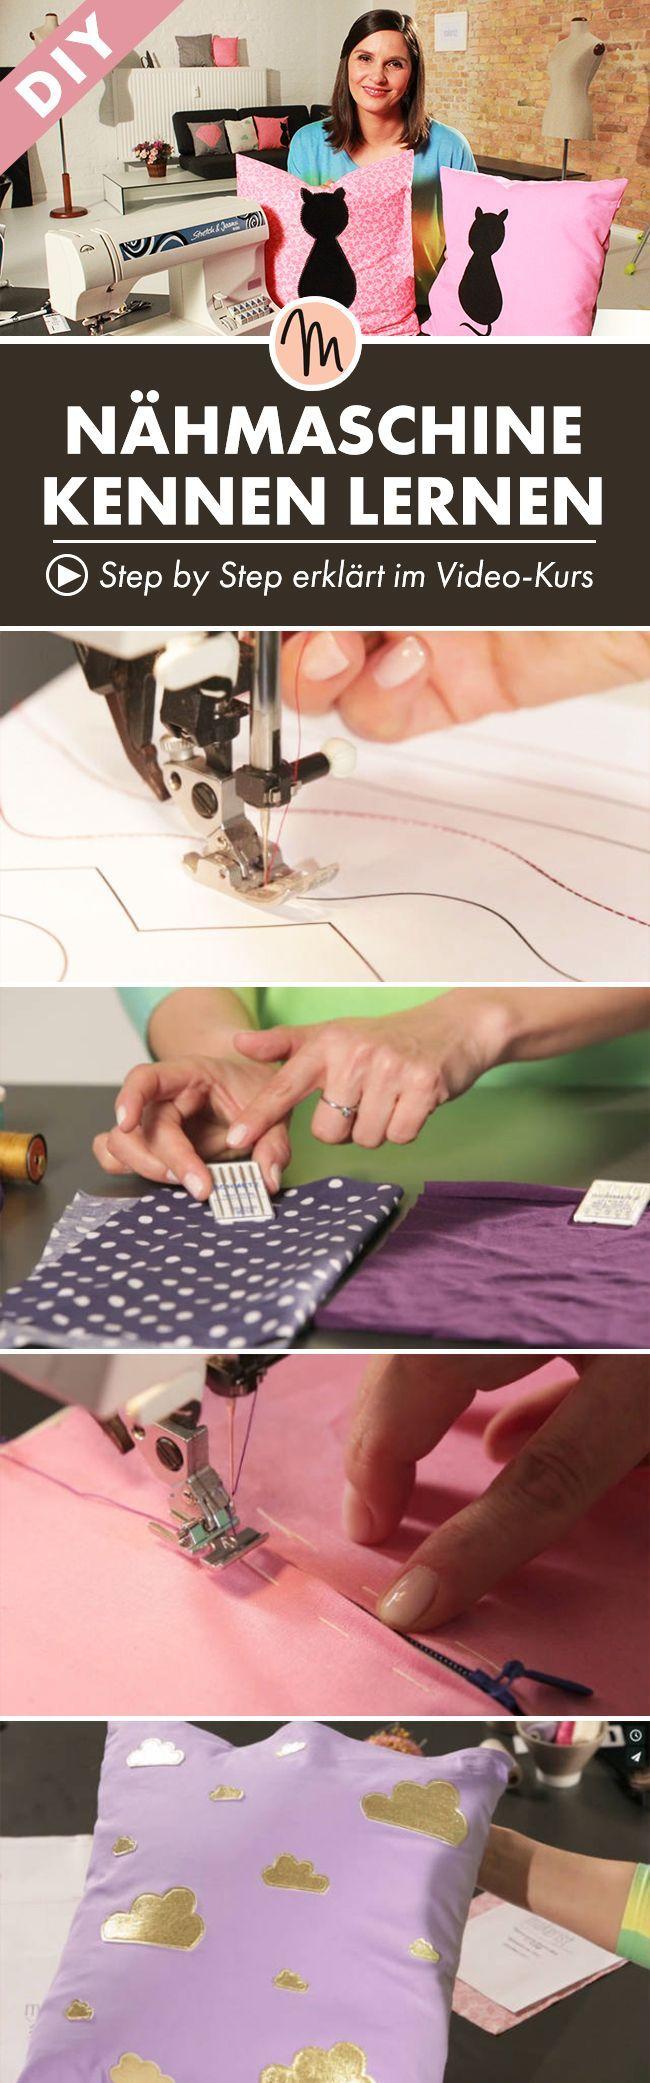 Grundkurs: Nähmaschine kennenlernen #sewinghacksvideos